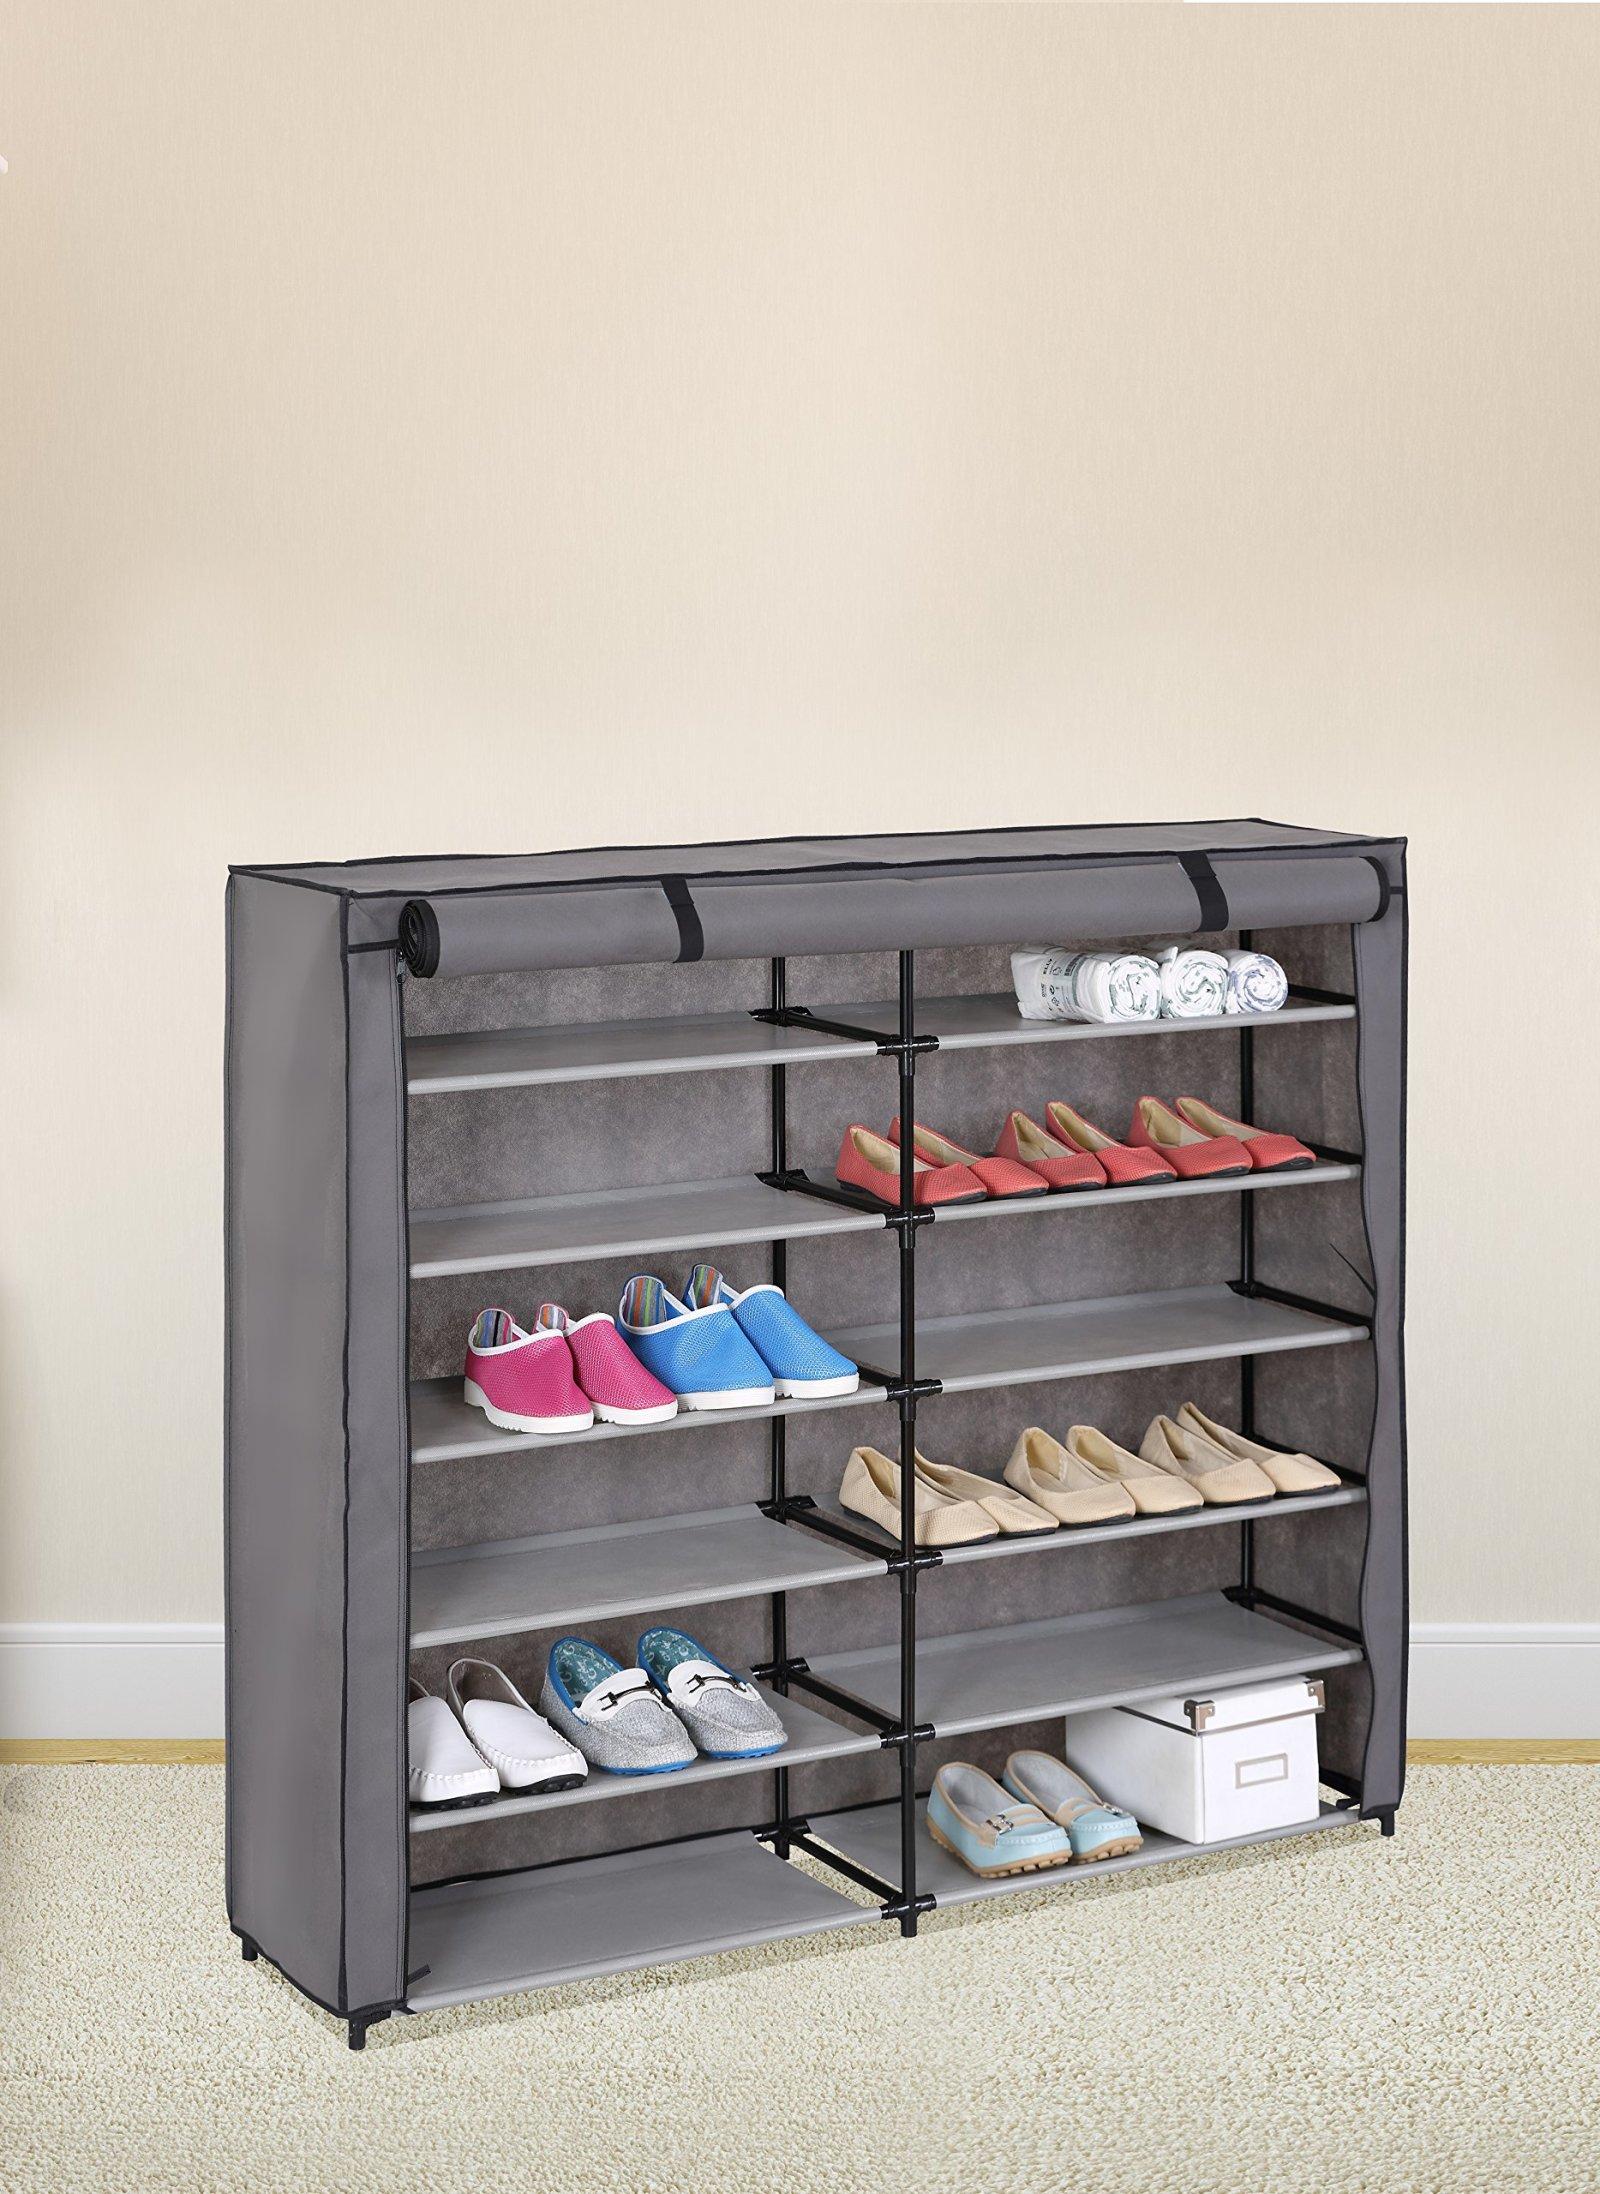 7 Tier Shoe Rack 42 Pair Portable Shoe Storage Cabinet Organizer Shelf U0026  Cover Part 41